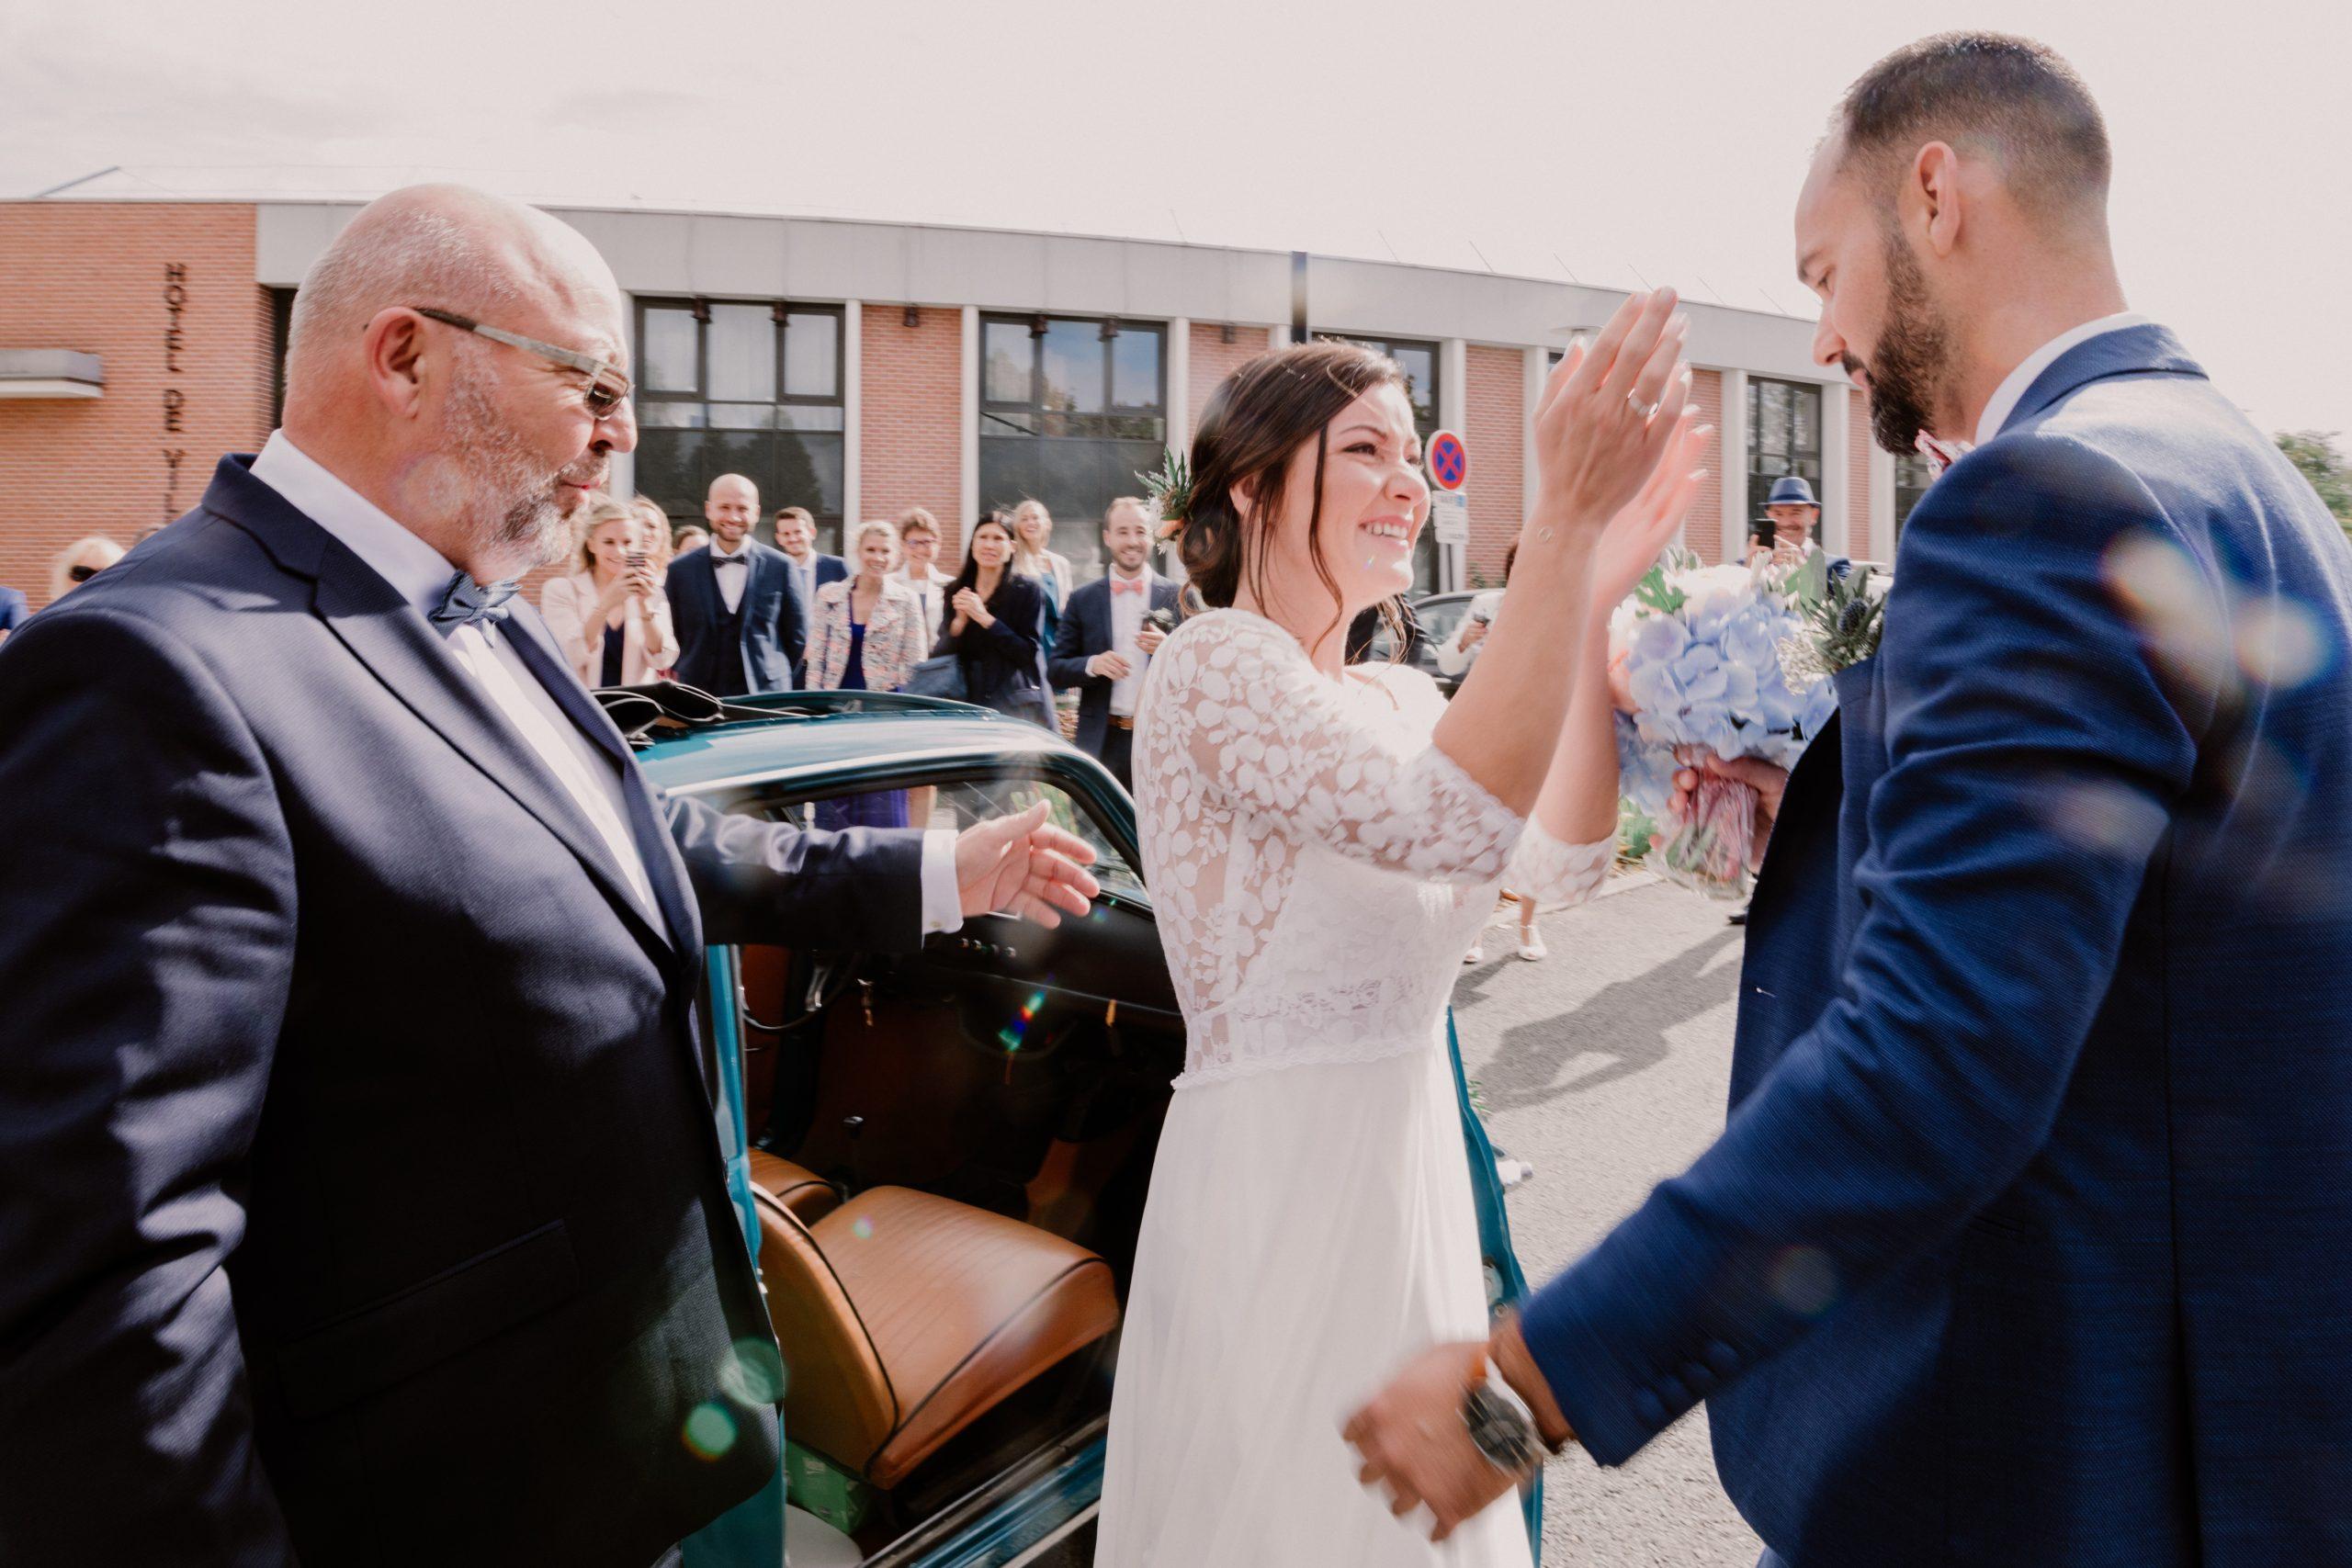 HD Mariage Aurelie Eric 139 scaled - Dagmara Bojenko - Eco-conscious Weddings, Births & Families